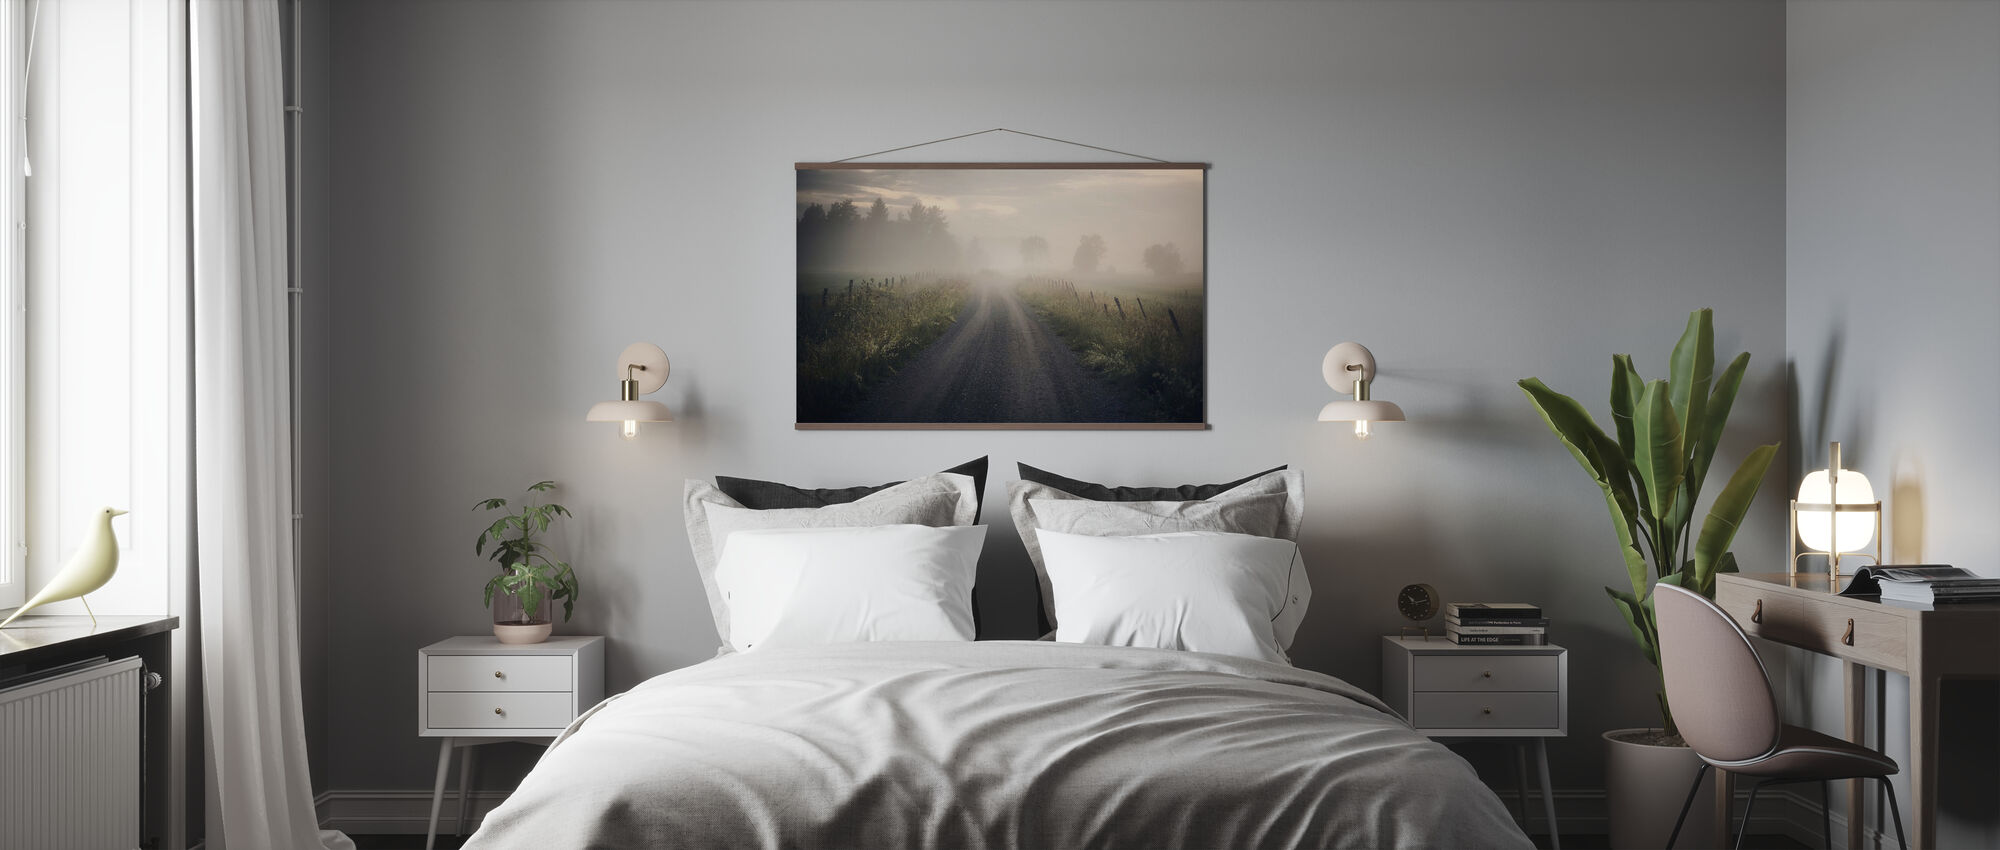 Misty Rural Road - Poster - Bedroom